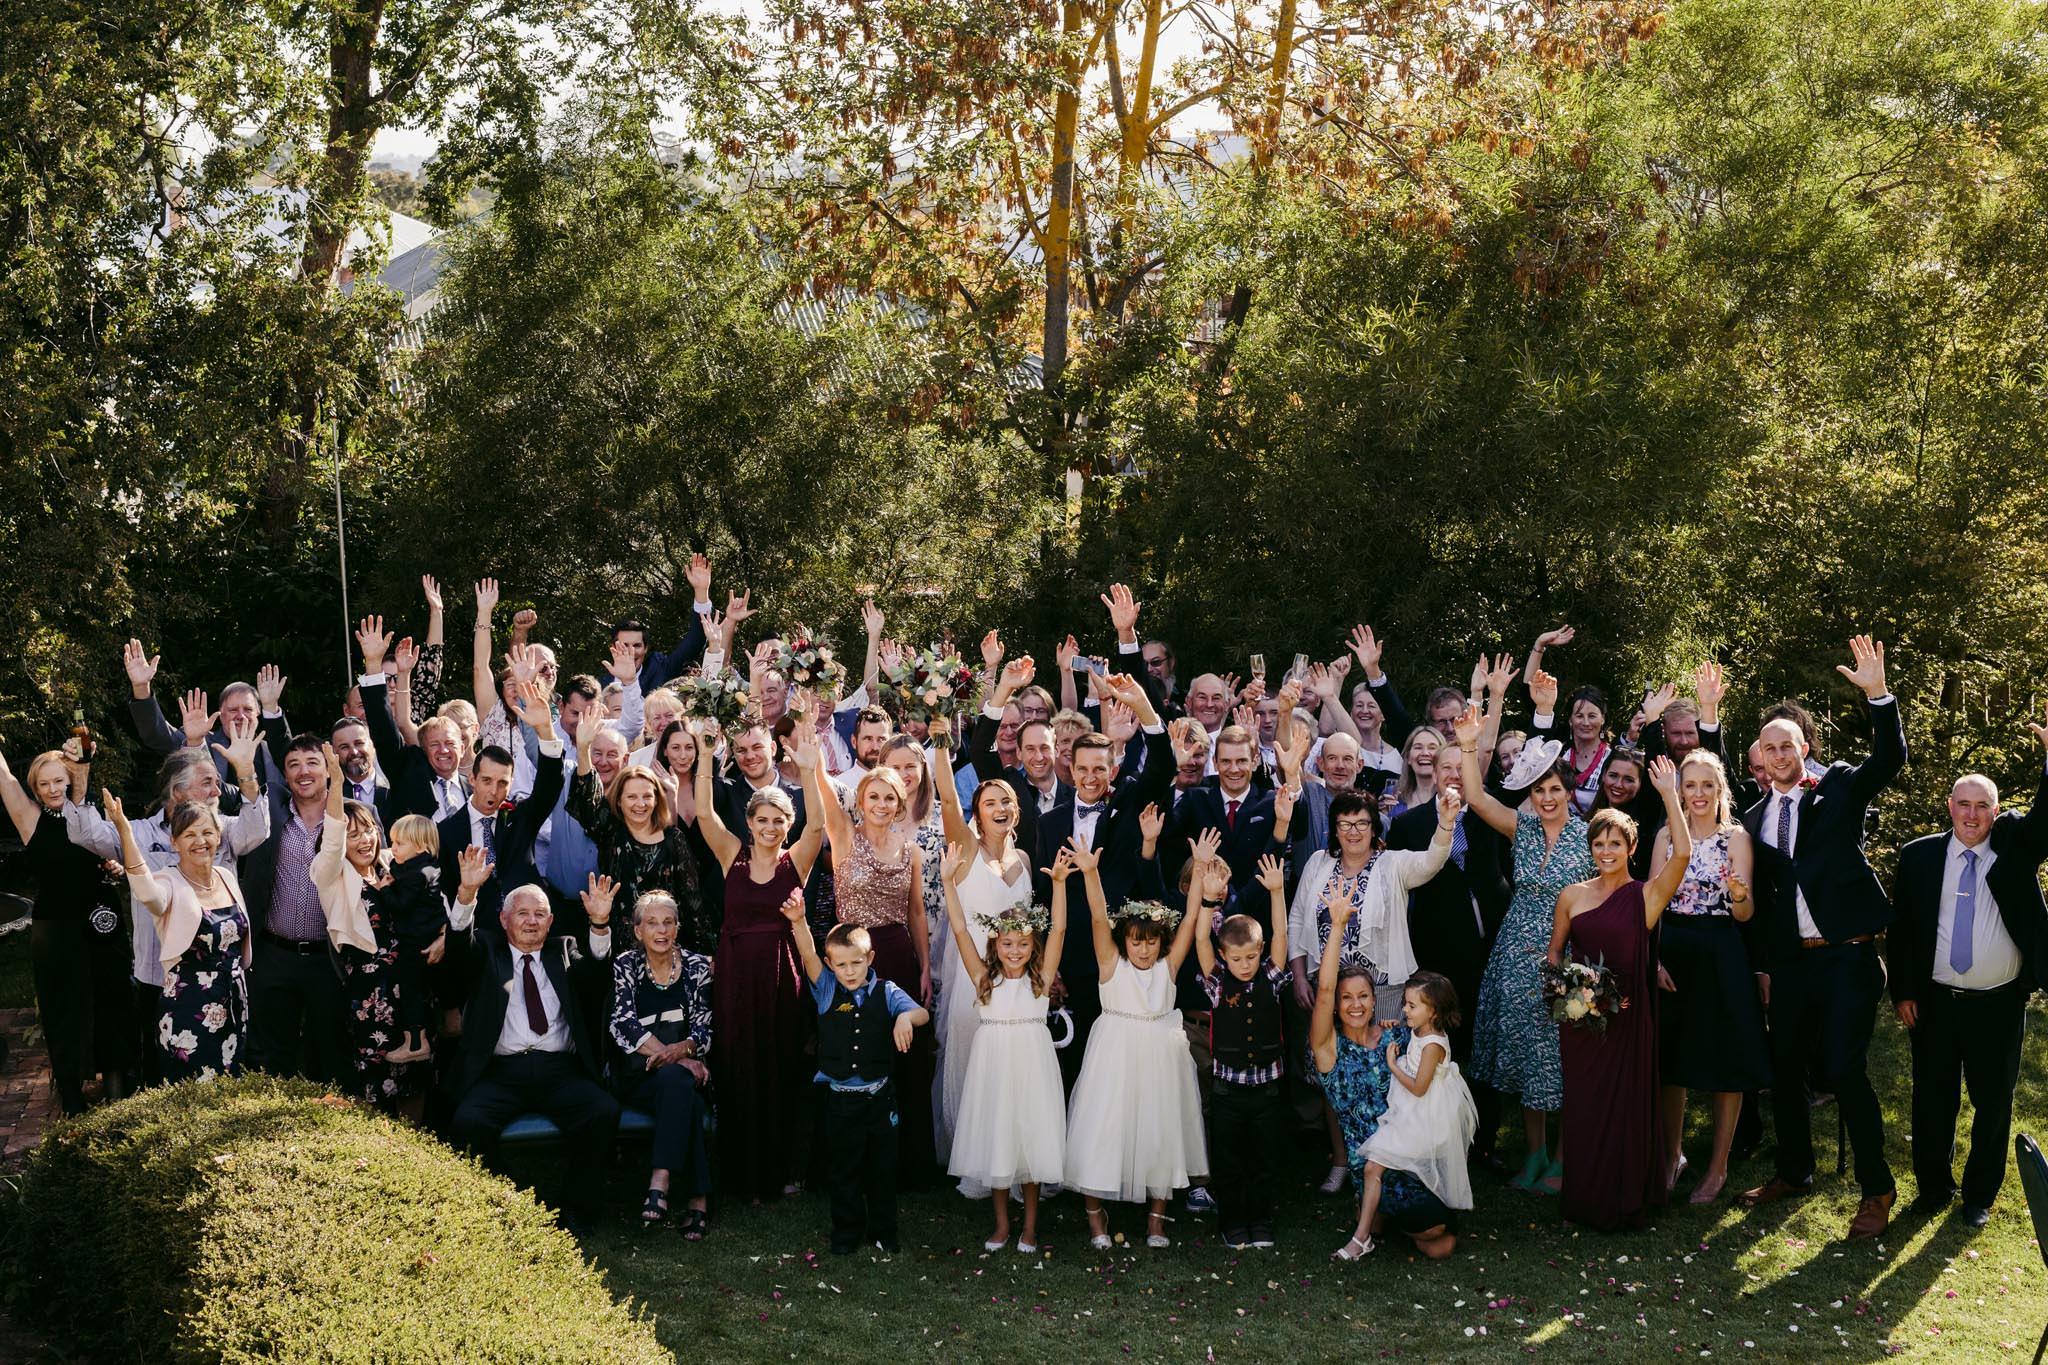 Erin Latimore Mudgee Canberra Wedding Photographer ROSEBANK GUESTHOUSE OLD THEATRE TONIC MILLTHORPE_452.JPG